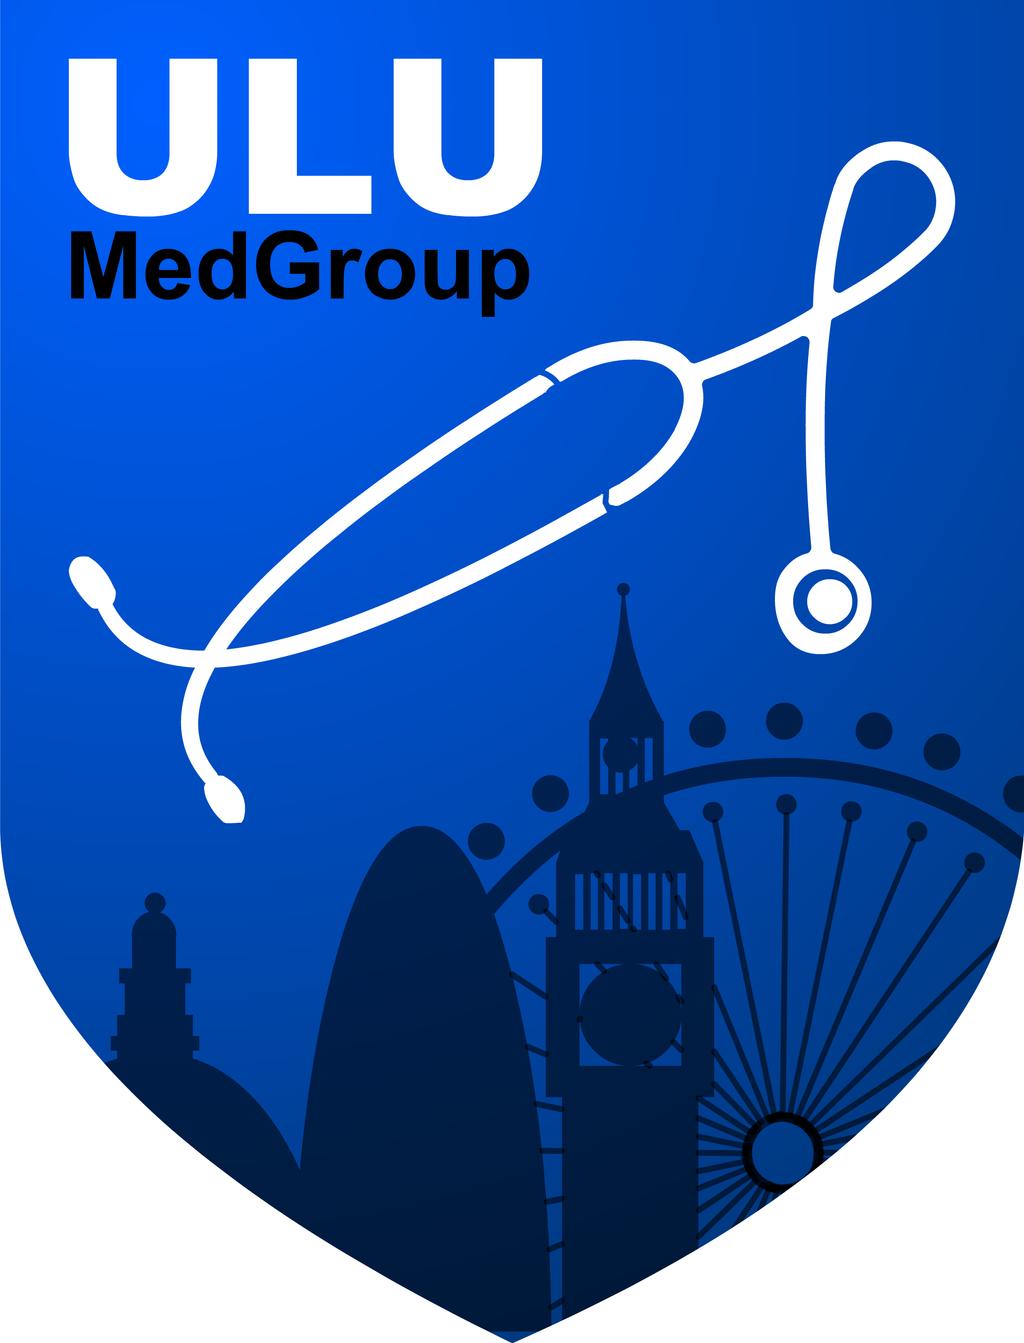 ULU Medgroup logo by mikesamy